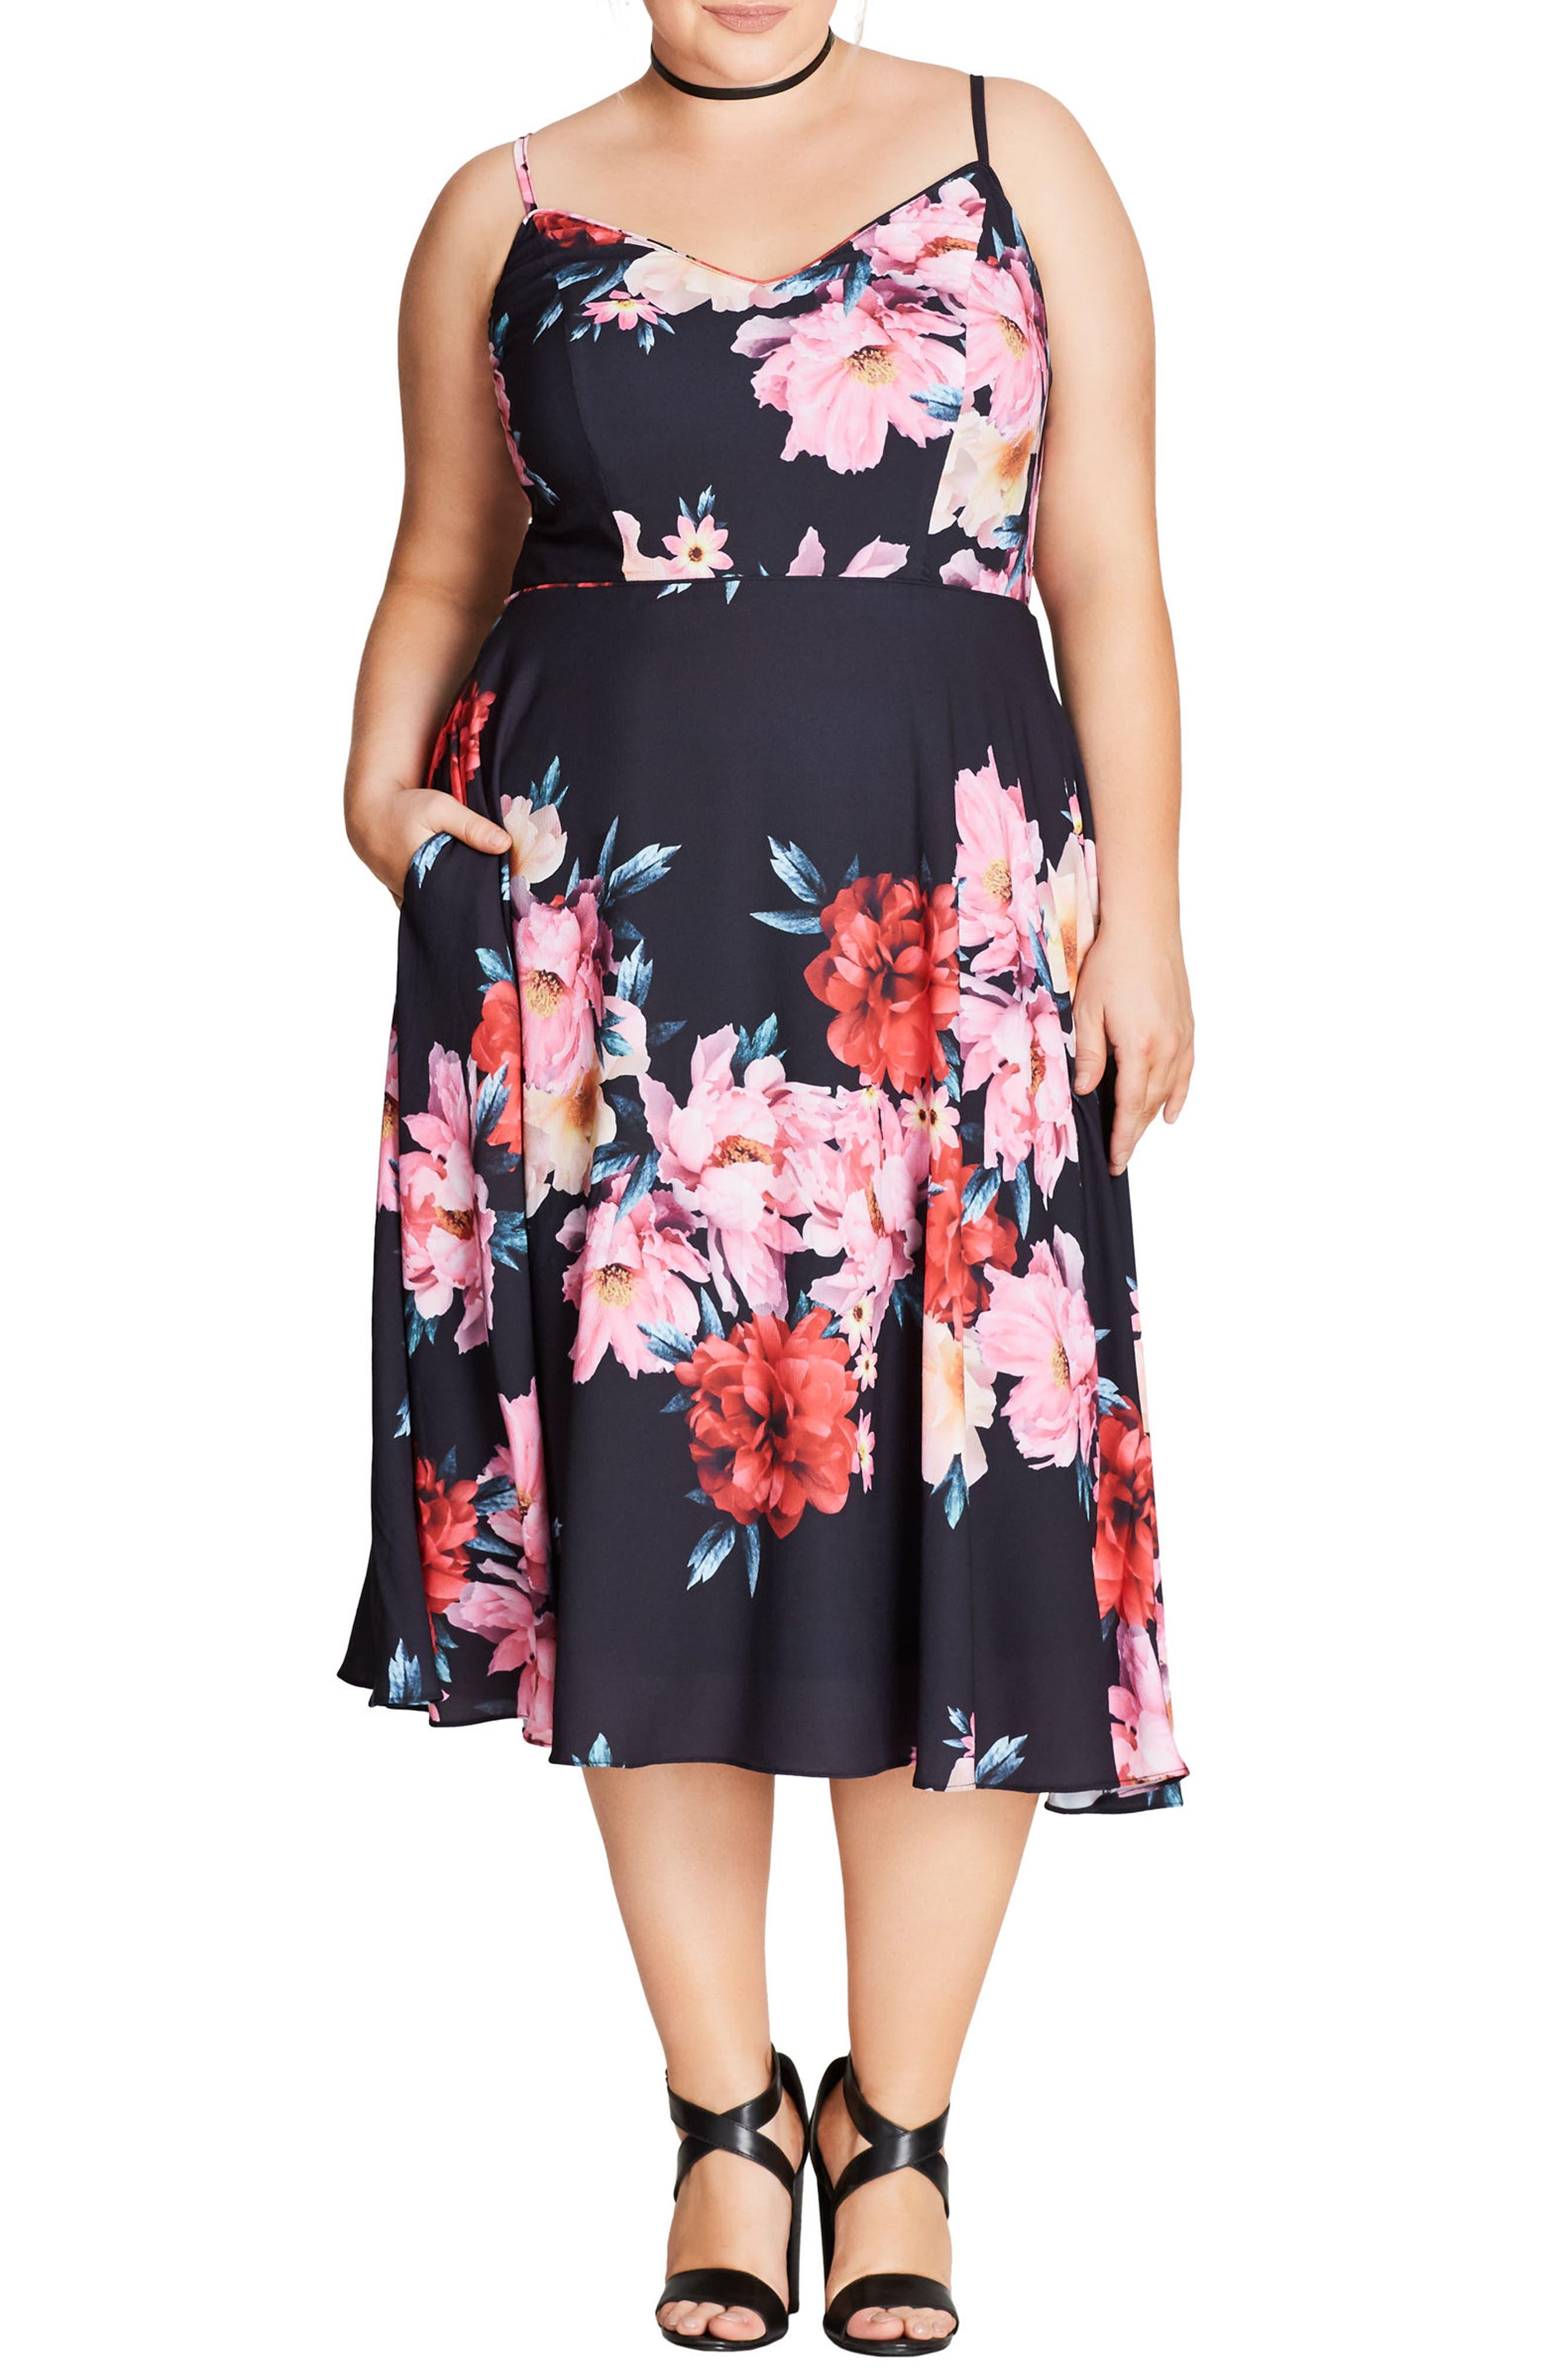 Main Image - City Chic Summer Fling Floral Print Midi Dress (Plus Size)